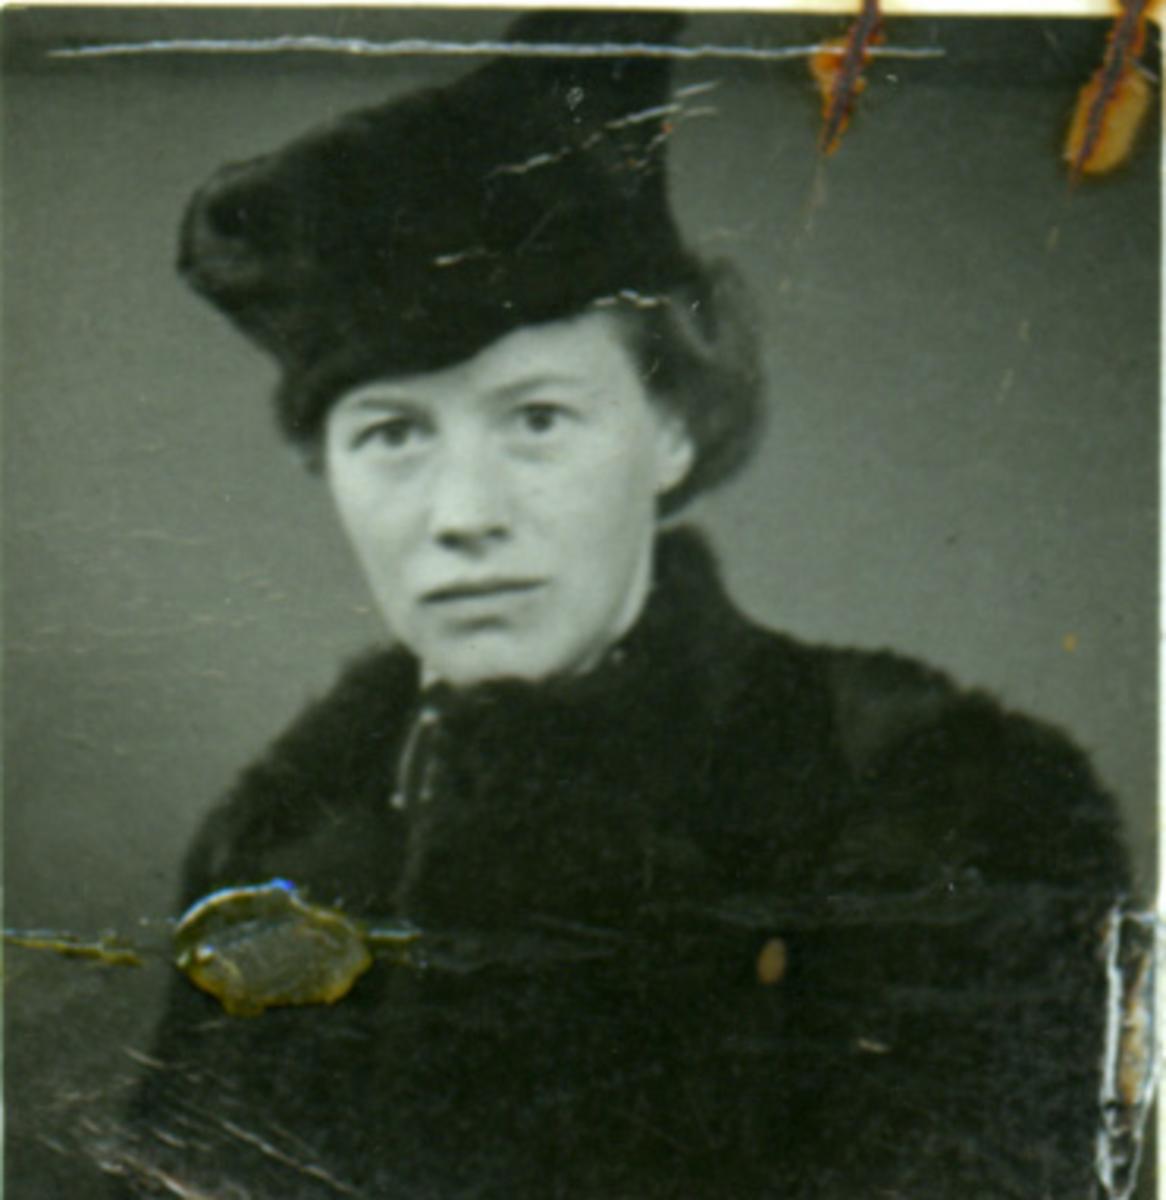 Album Ubåtjager King Haakon VII 1942-1946 Marit Haugene 17.04.1942.